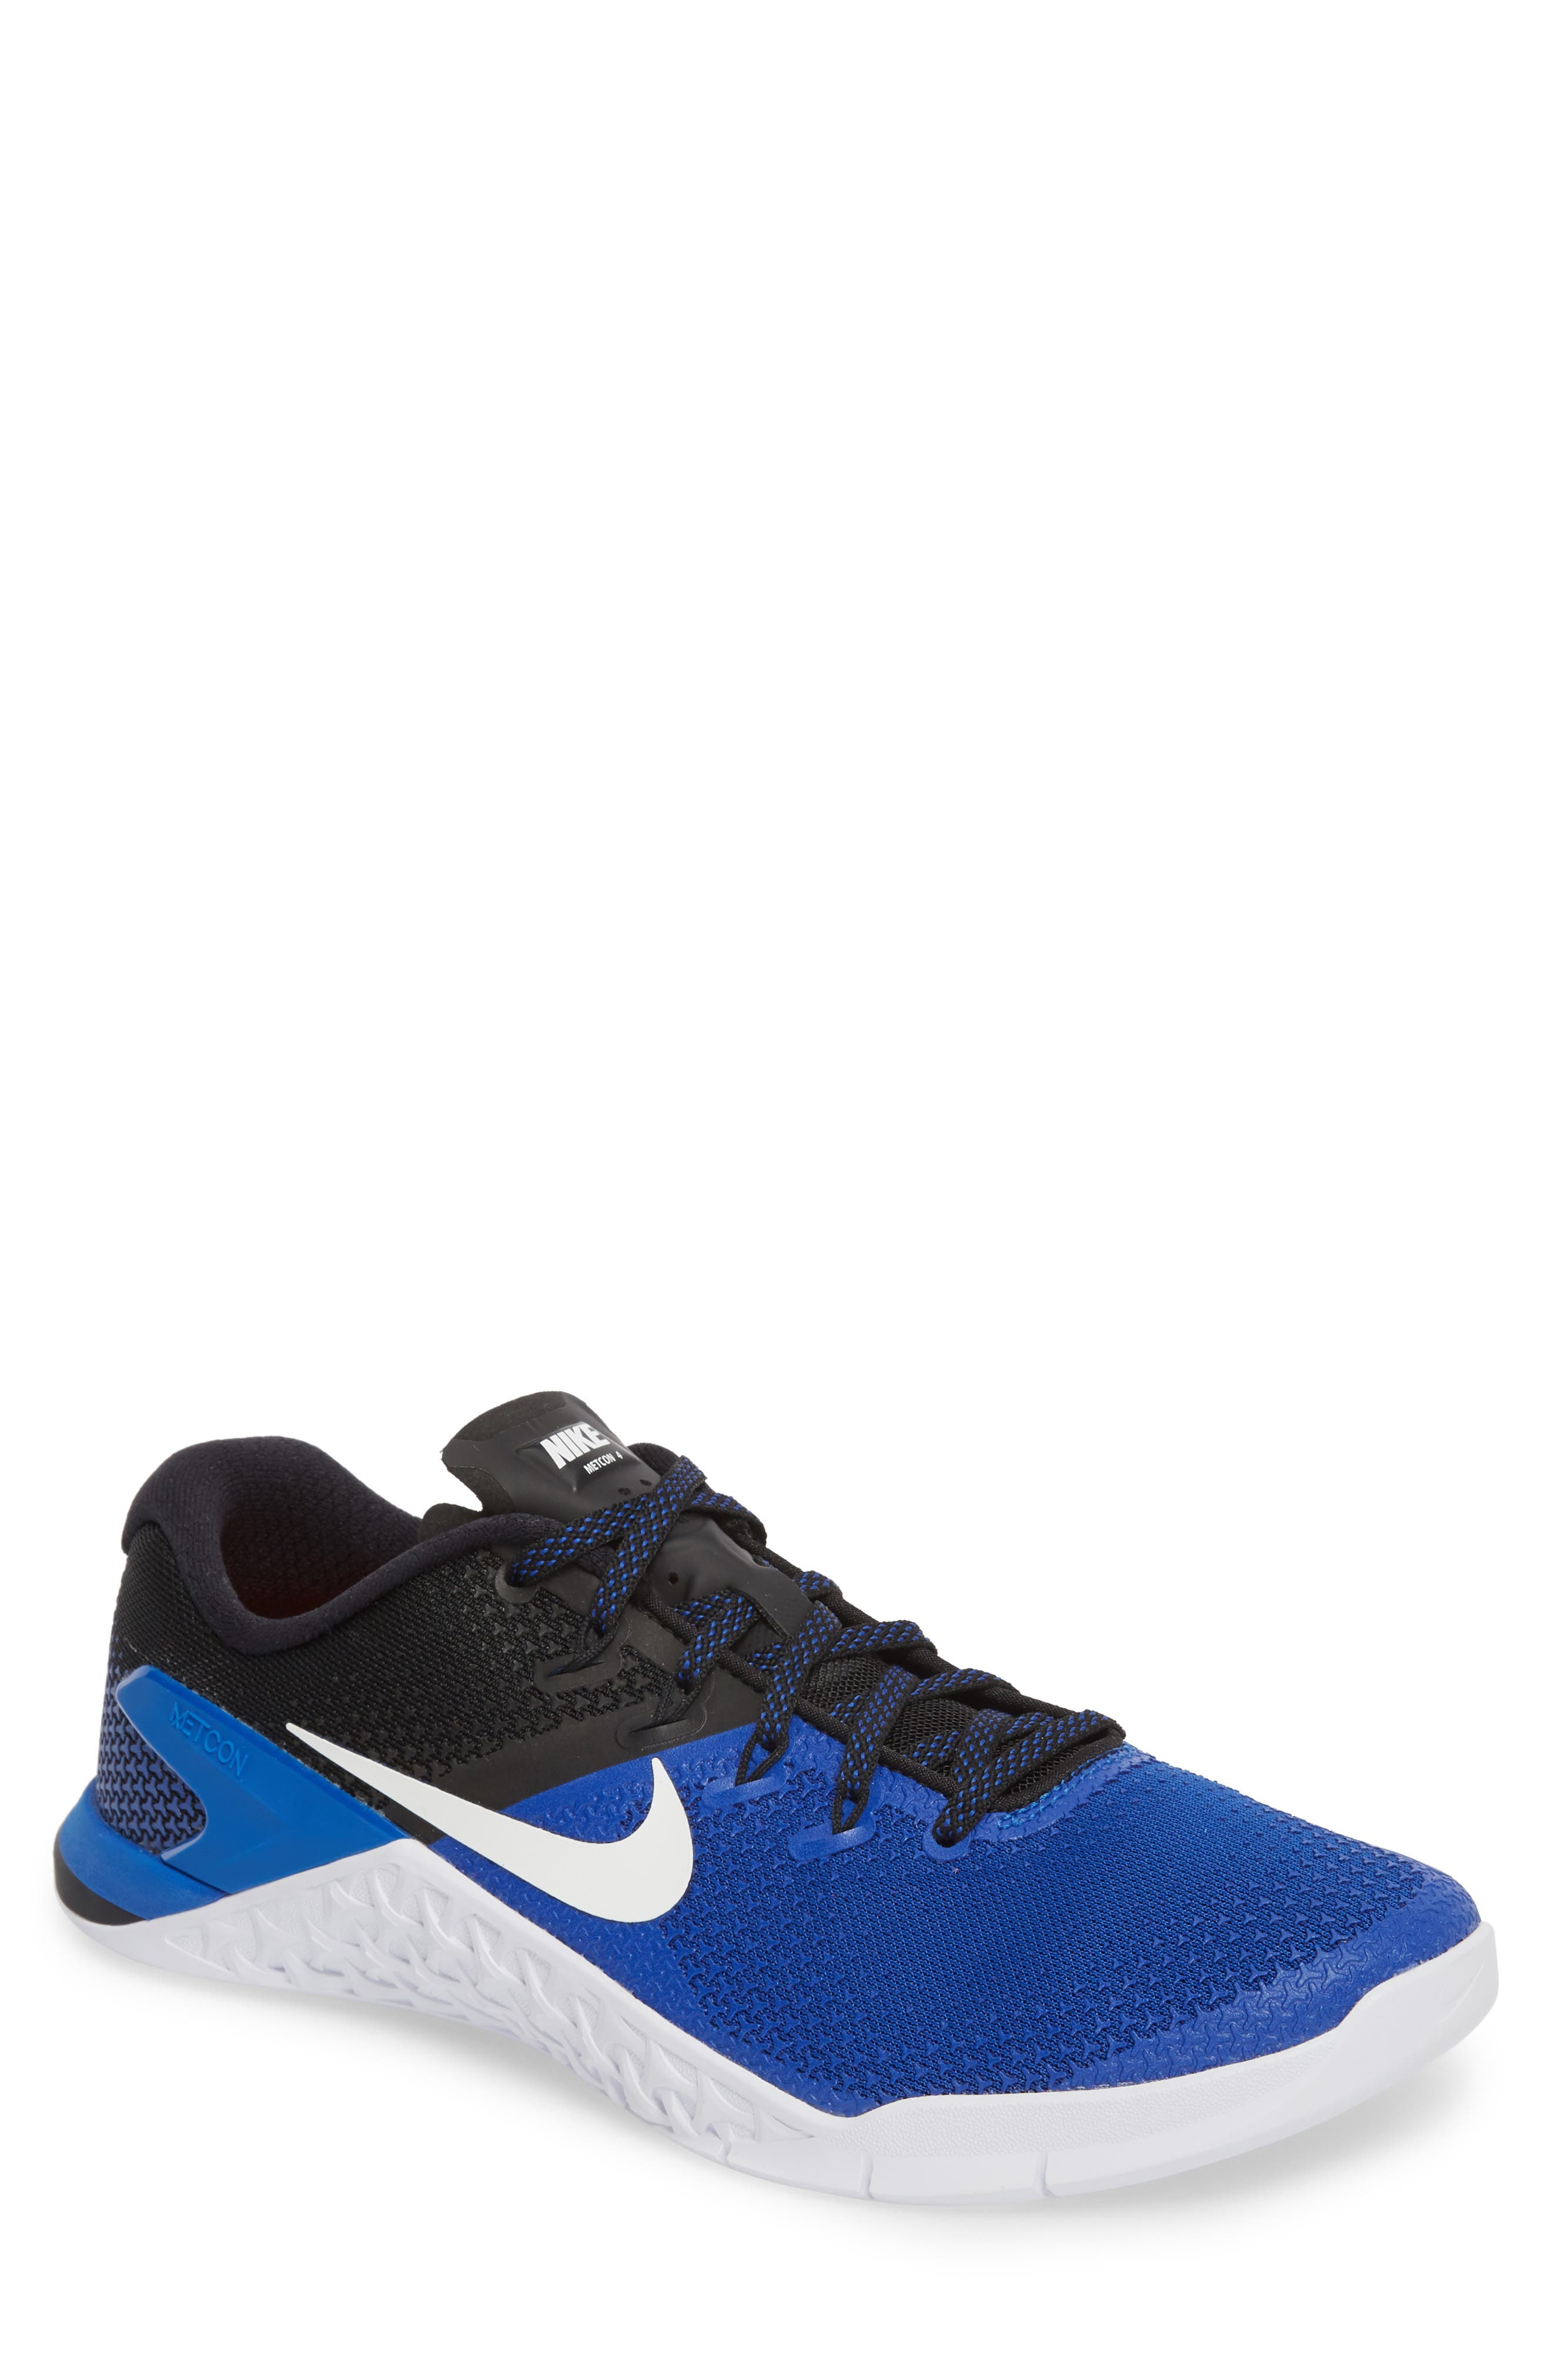 Nike Metcon 4 Training Shoe (Men